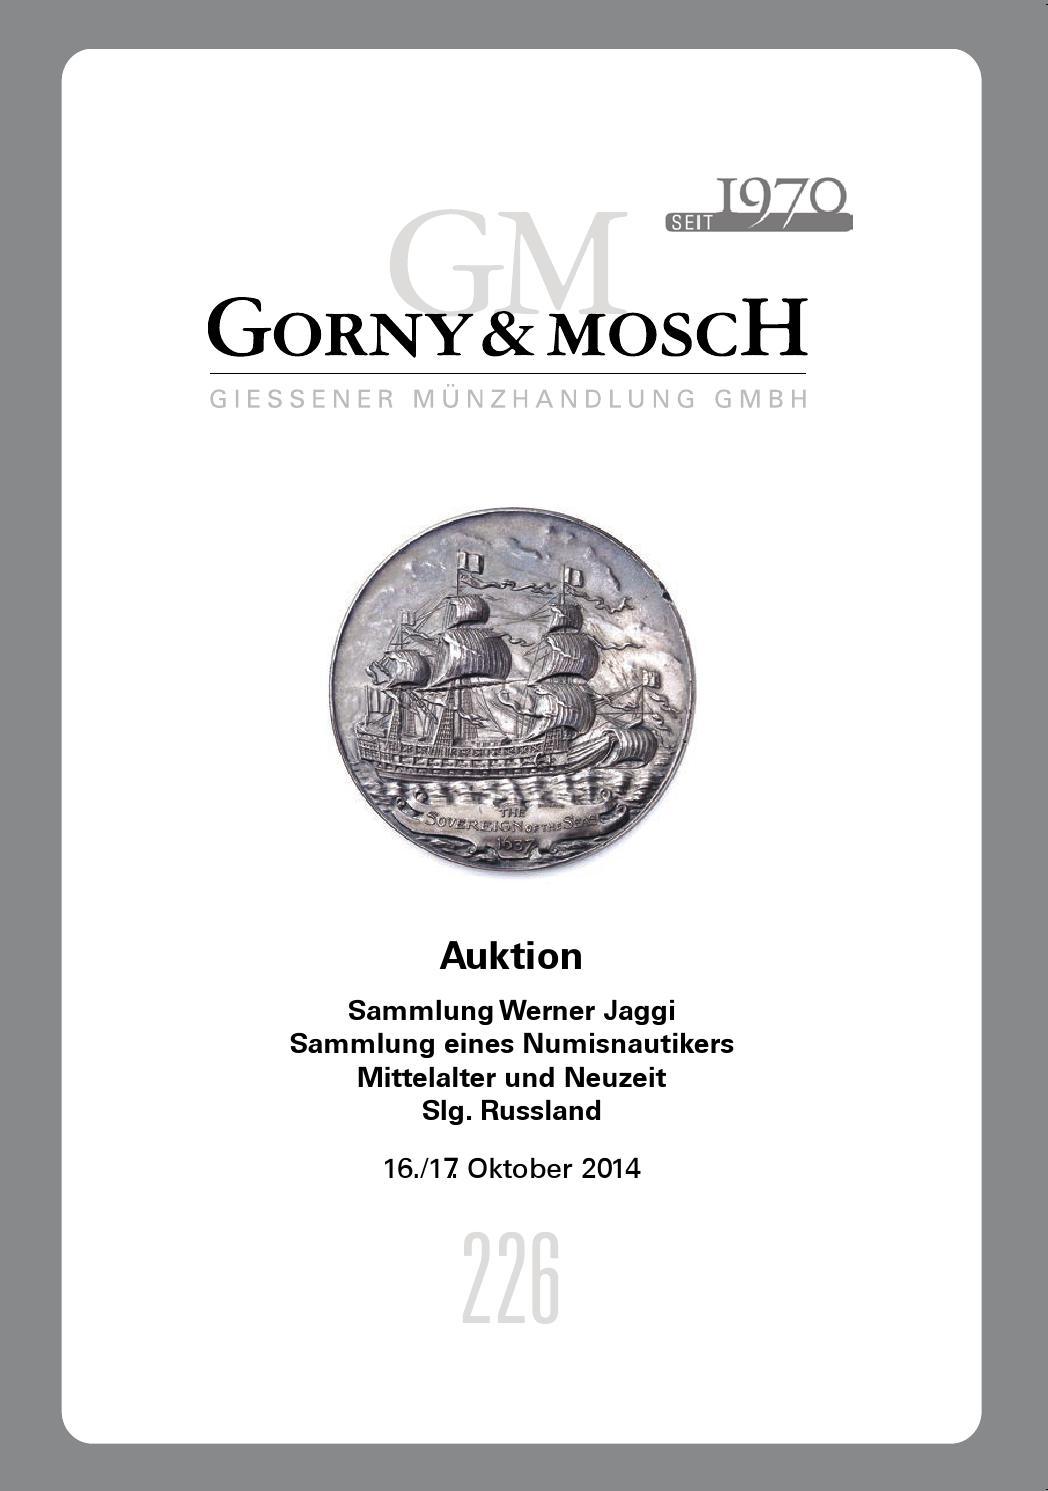 Gorny & Mosch Auktionskatalog 226 by Gorny & Mosch Giessener ...